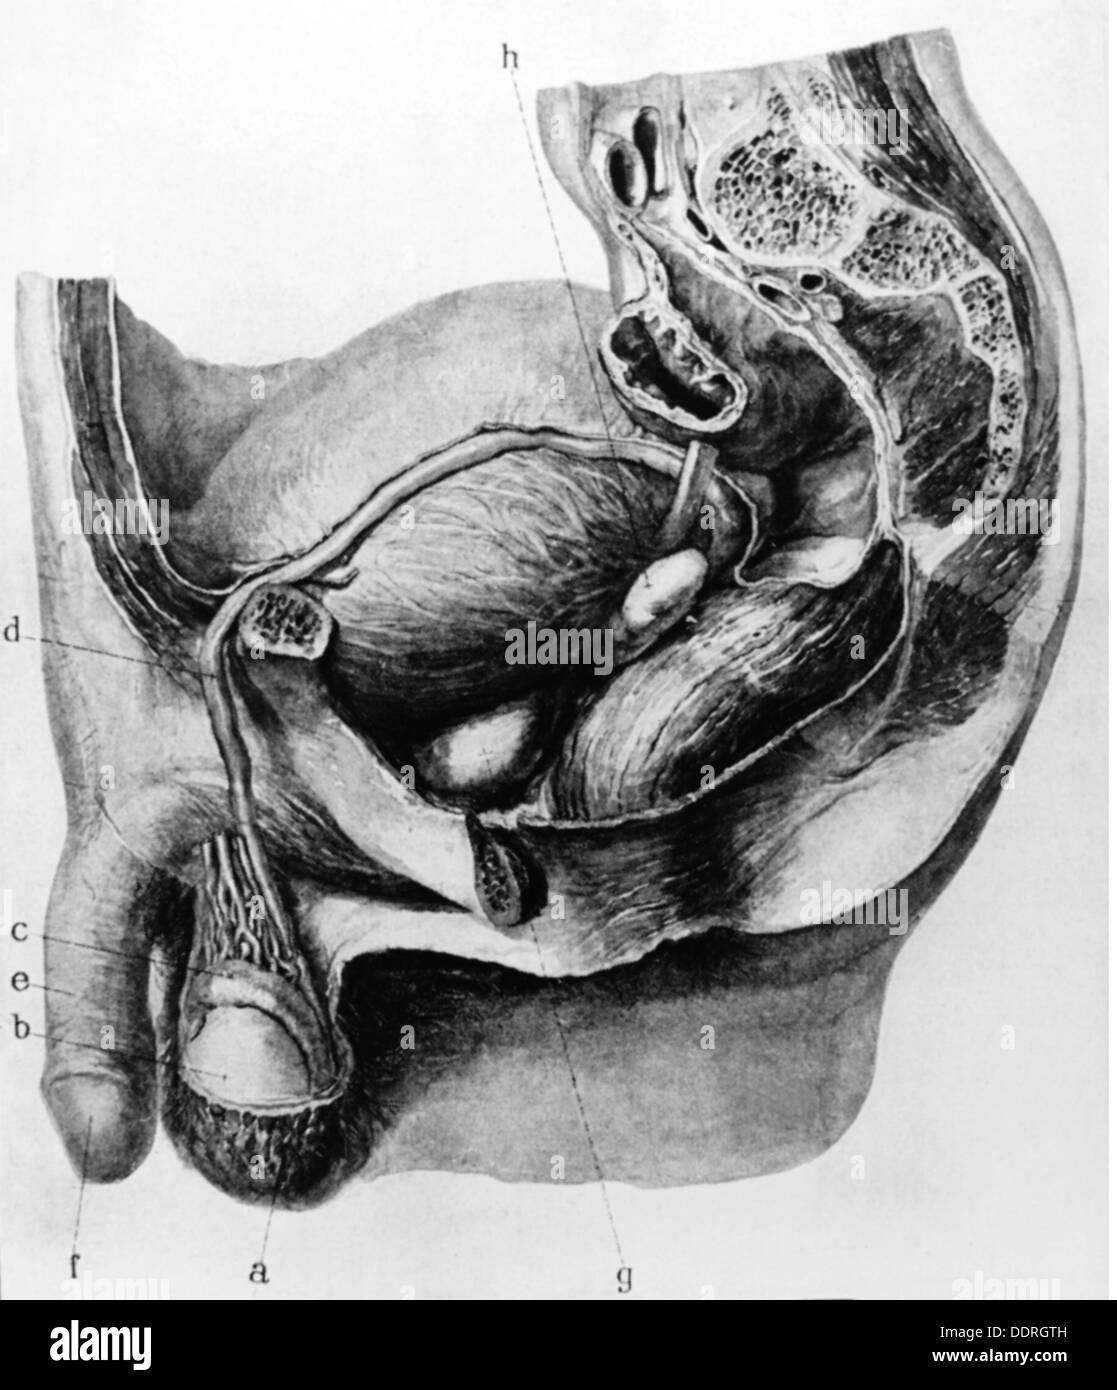 Medicine anatomy sexual organs schematic diagram of the male medicine anatomy sexual organs schematic diagram of the male genital with pelvis drawing circa 1910 20th century 1910s 10s pooptronica Images